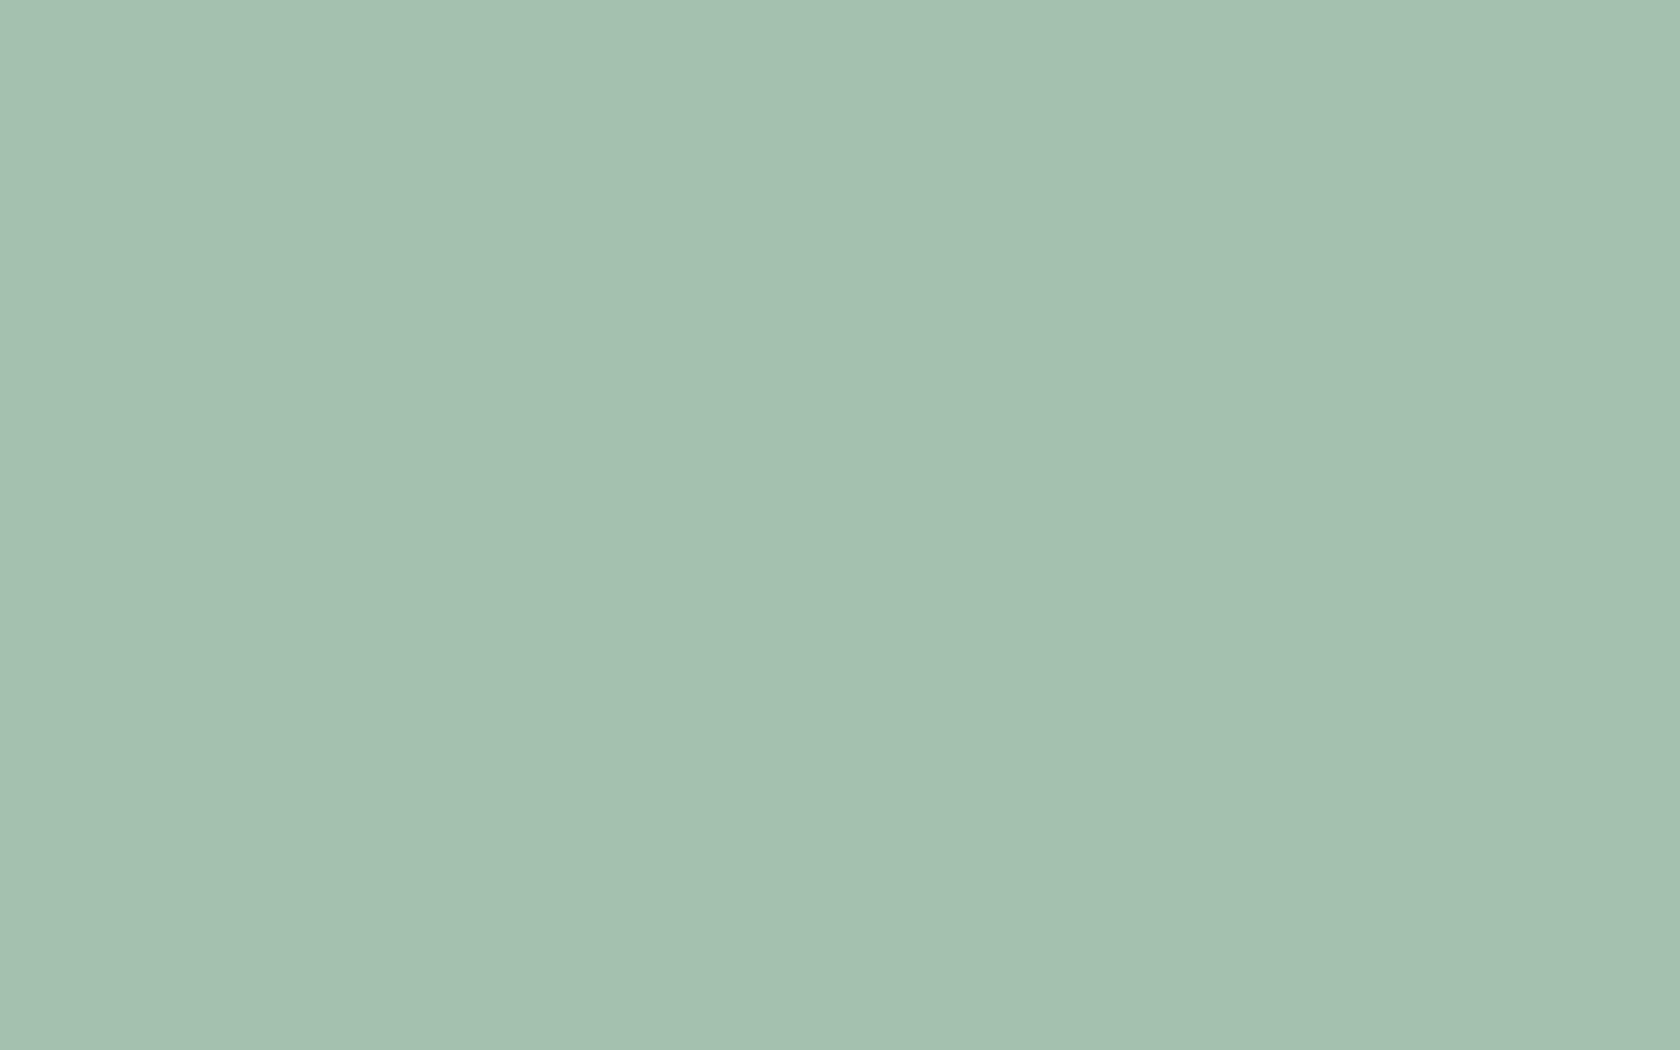 1680x1050 Cambridge Blue Solid Color Background